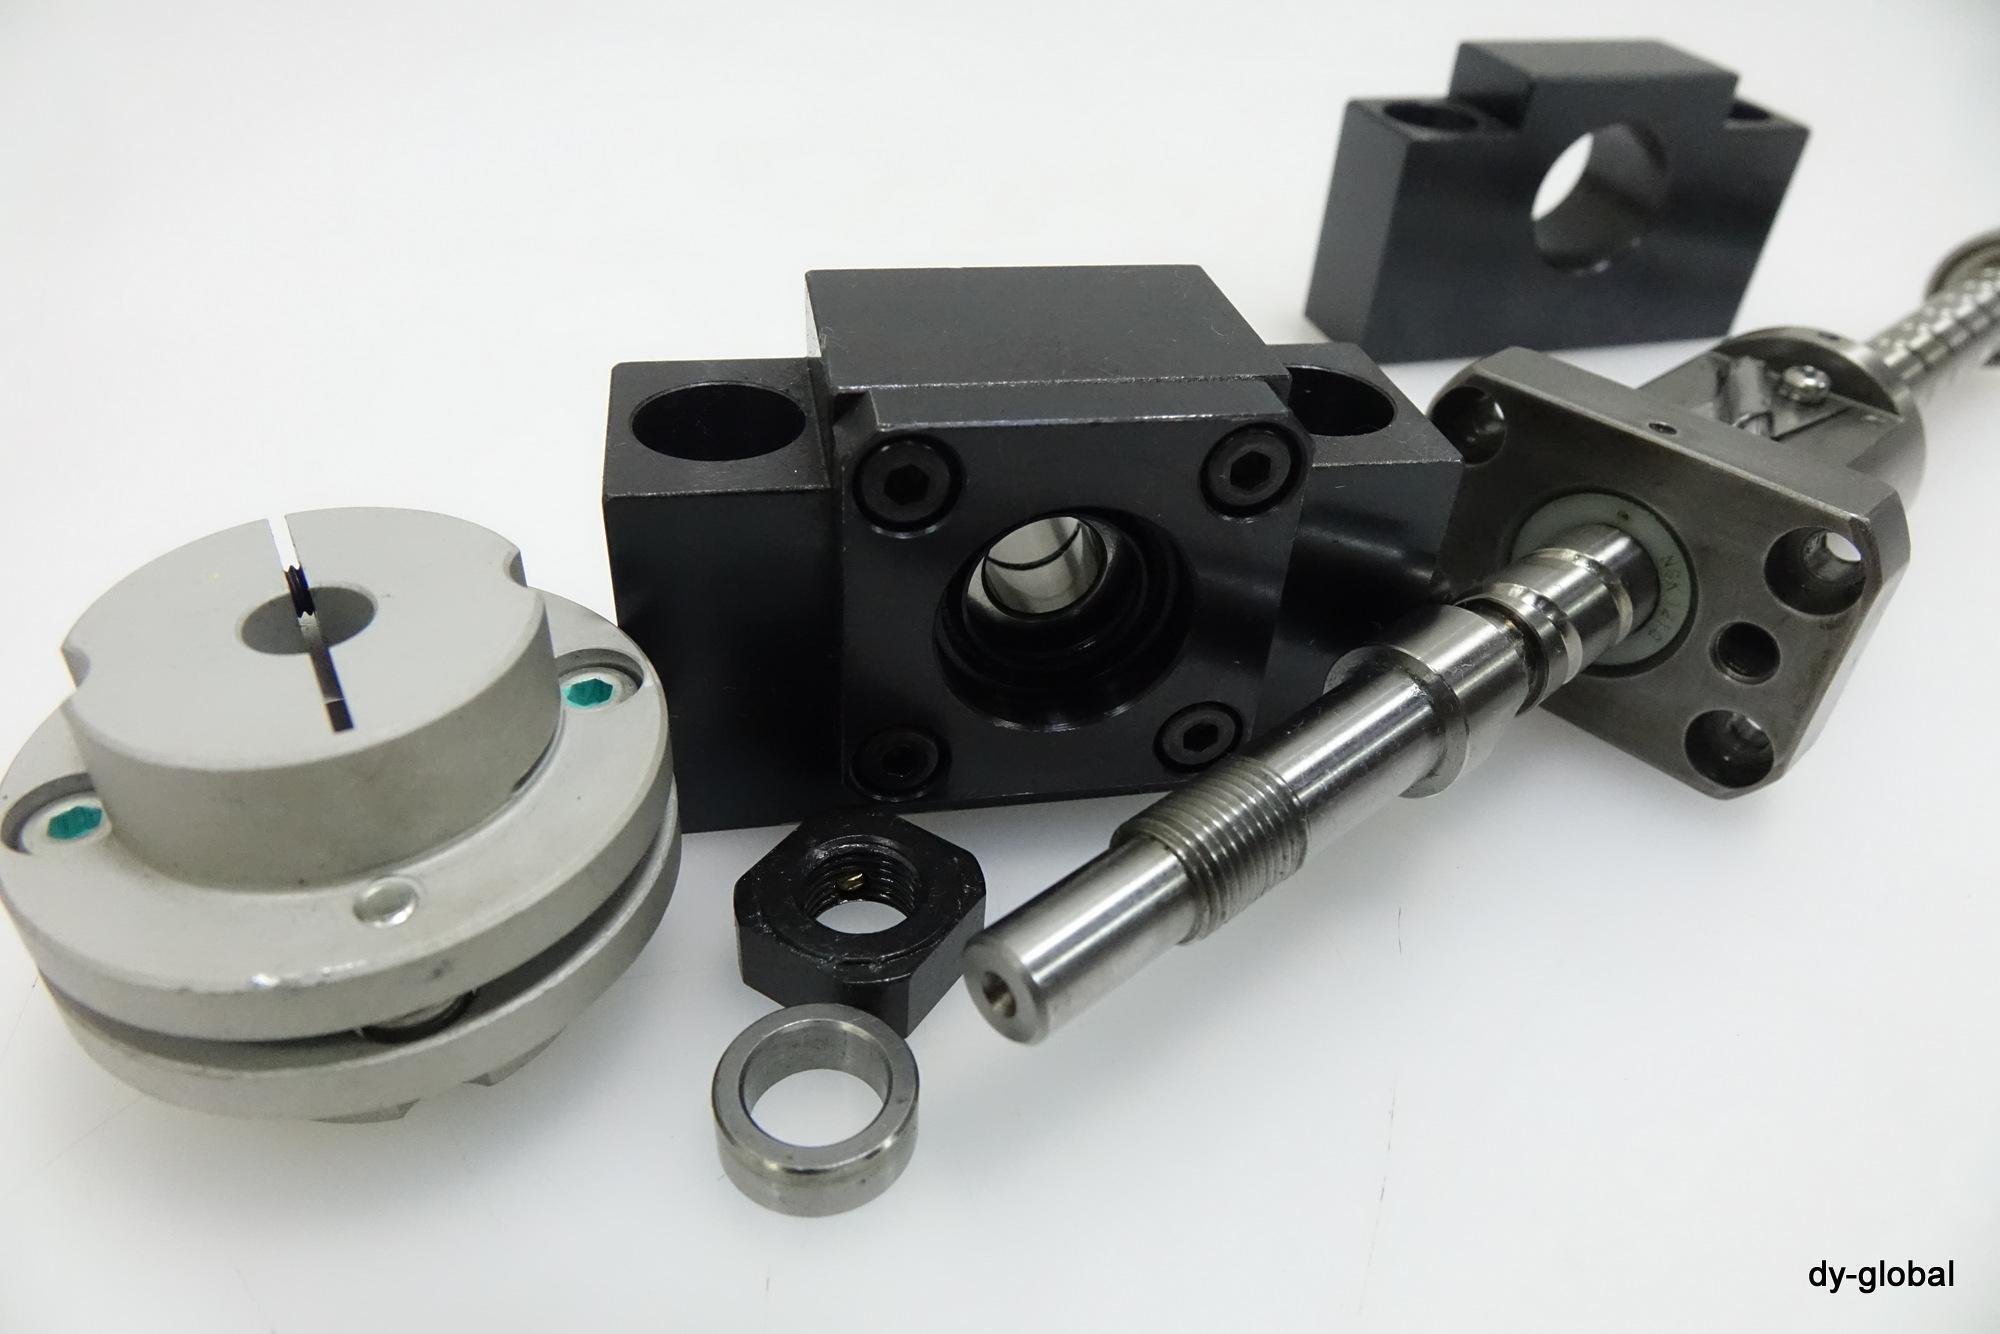 NSK 중고 연삭 볼스크류 Ground Ball Screw W1201FA-5P-C5Z+230mm+AK10+AF10+Coupling Mini lathe DIY CNC : FAParts - 네이버쇼핑